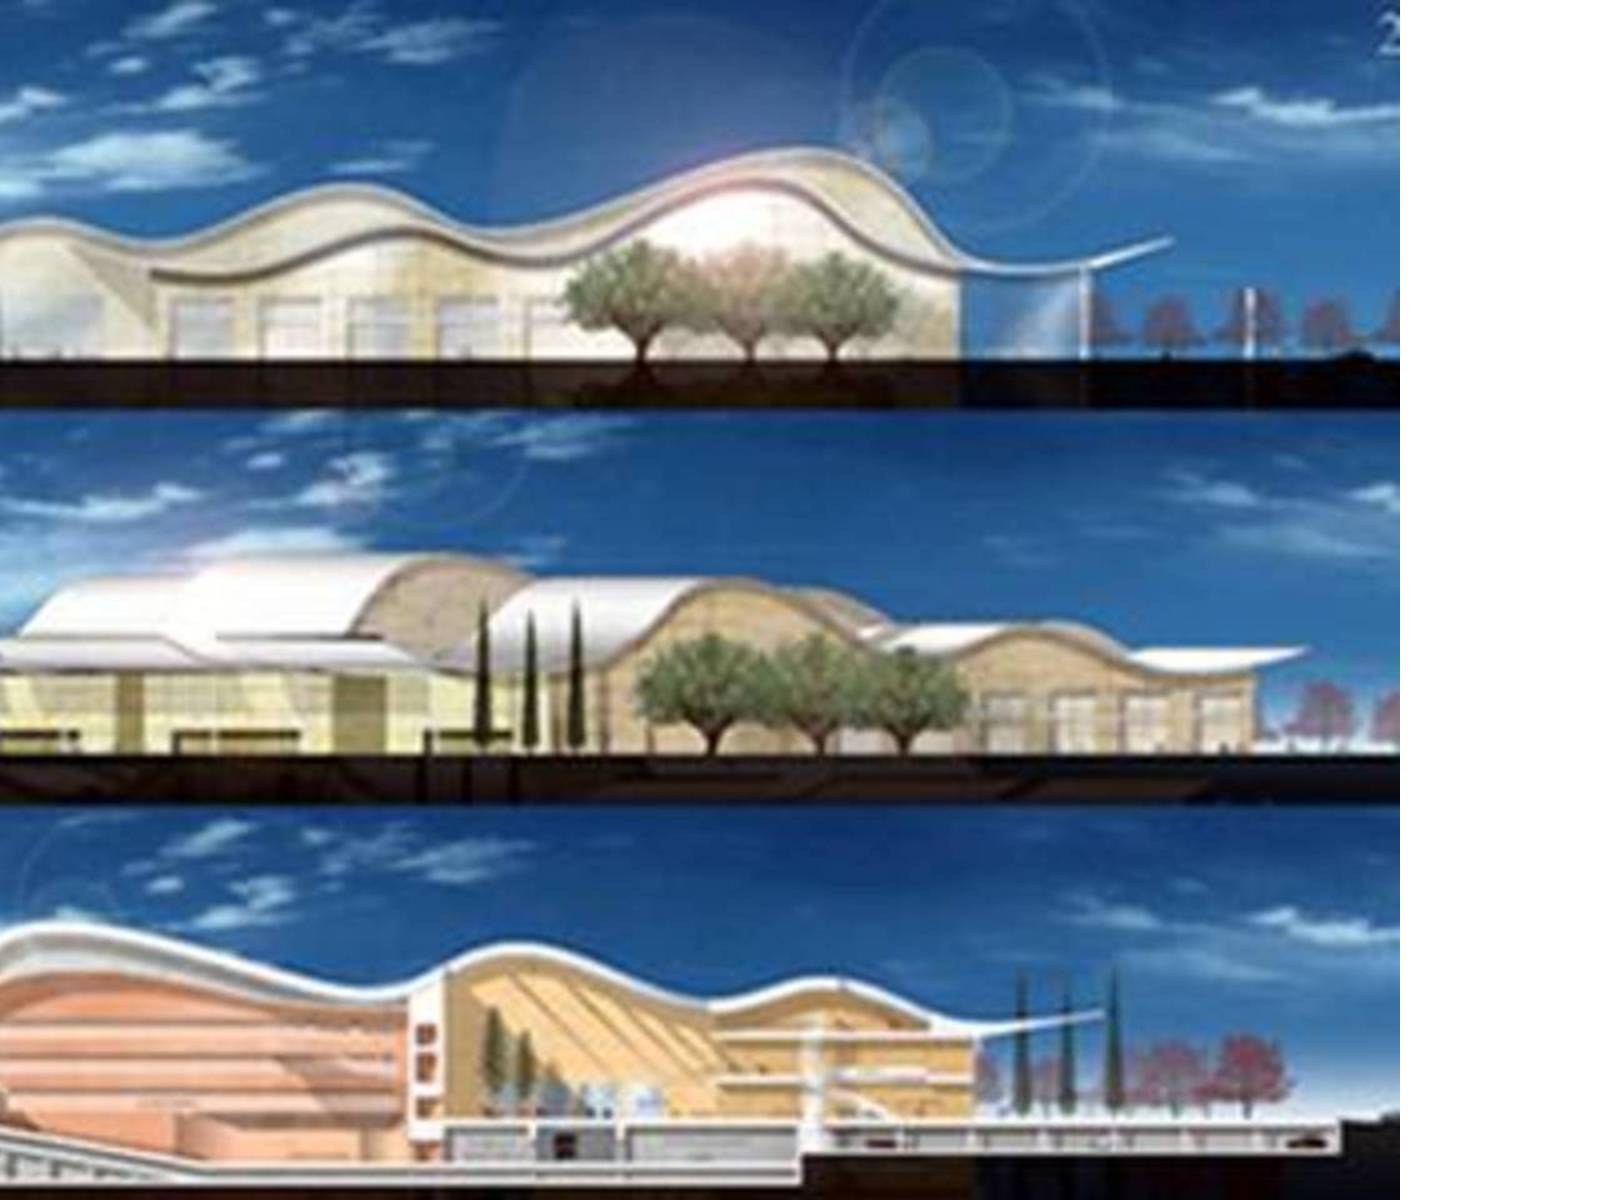 Ricardo Bofill: Villa Cultural de PradoValladolid, in costruzione